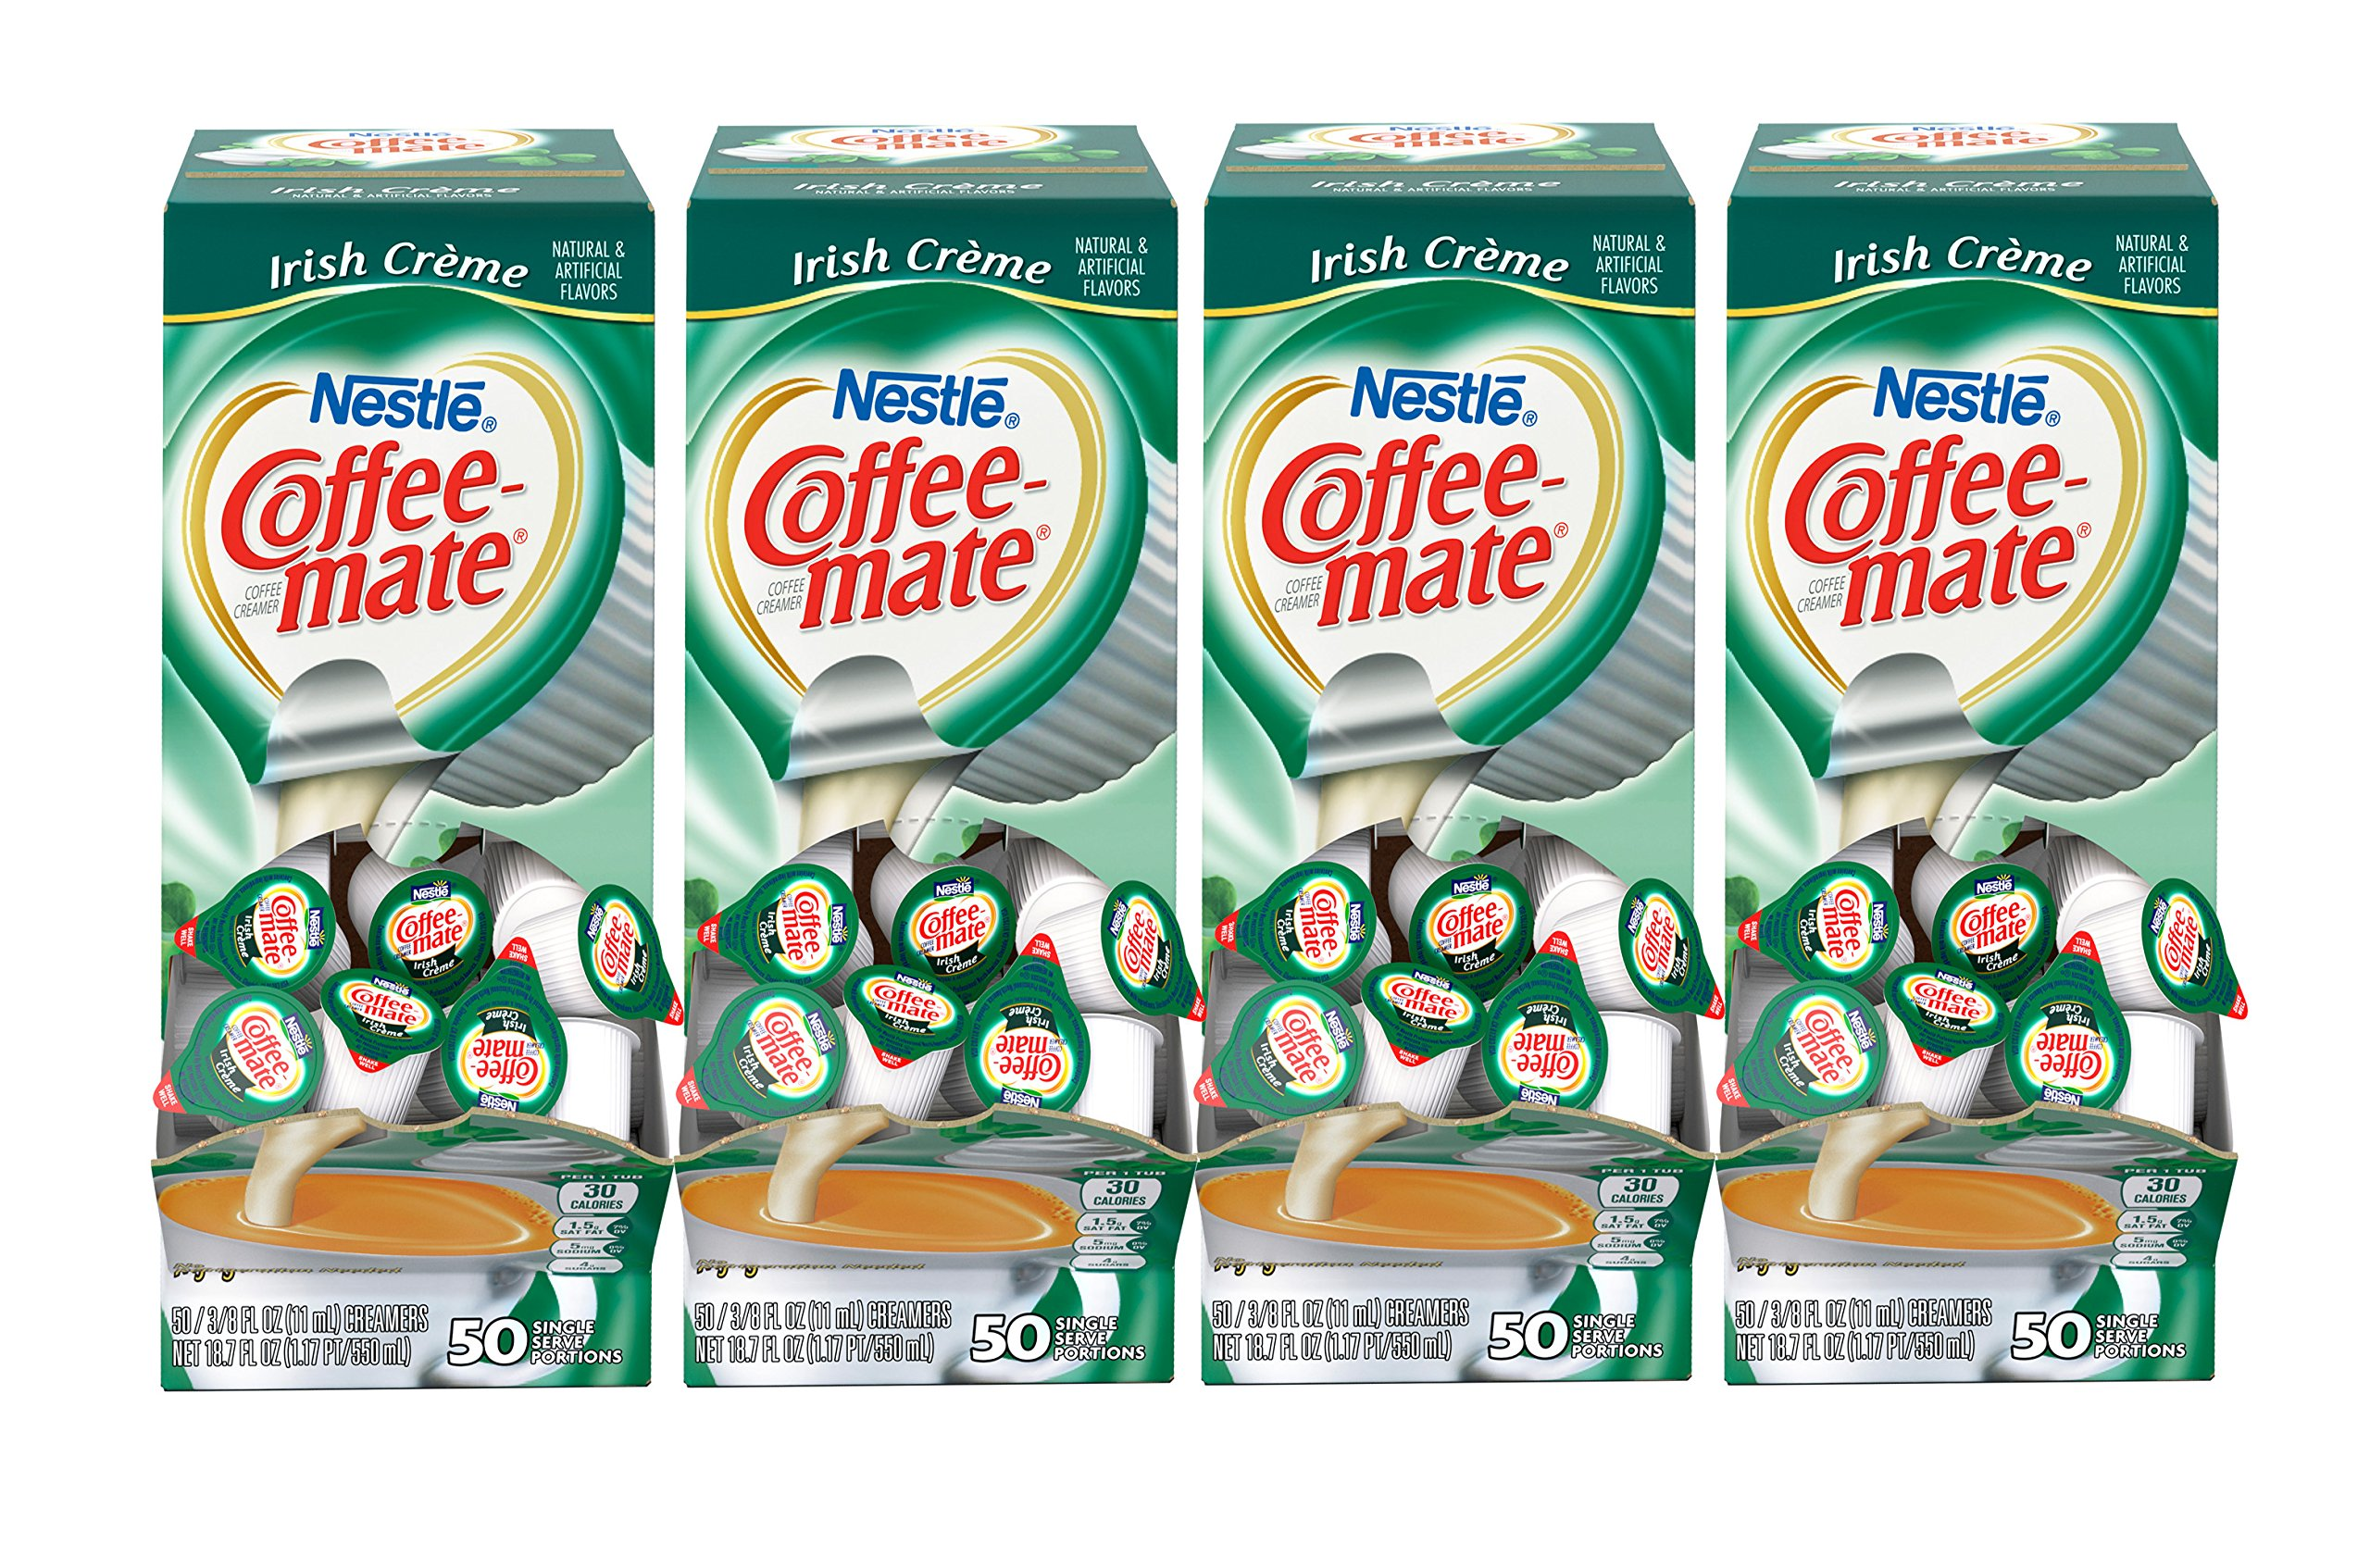 NESTLE COFFEE-MATE Coffee Creamer, Irish Creme, liquid creamer singles, Pack of 200 by Nestle Coffee Mate (Image #1)